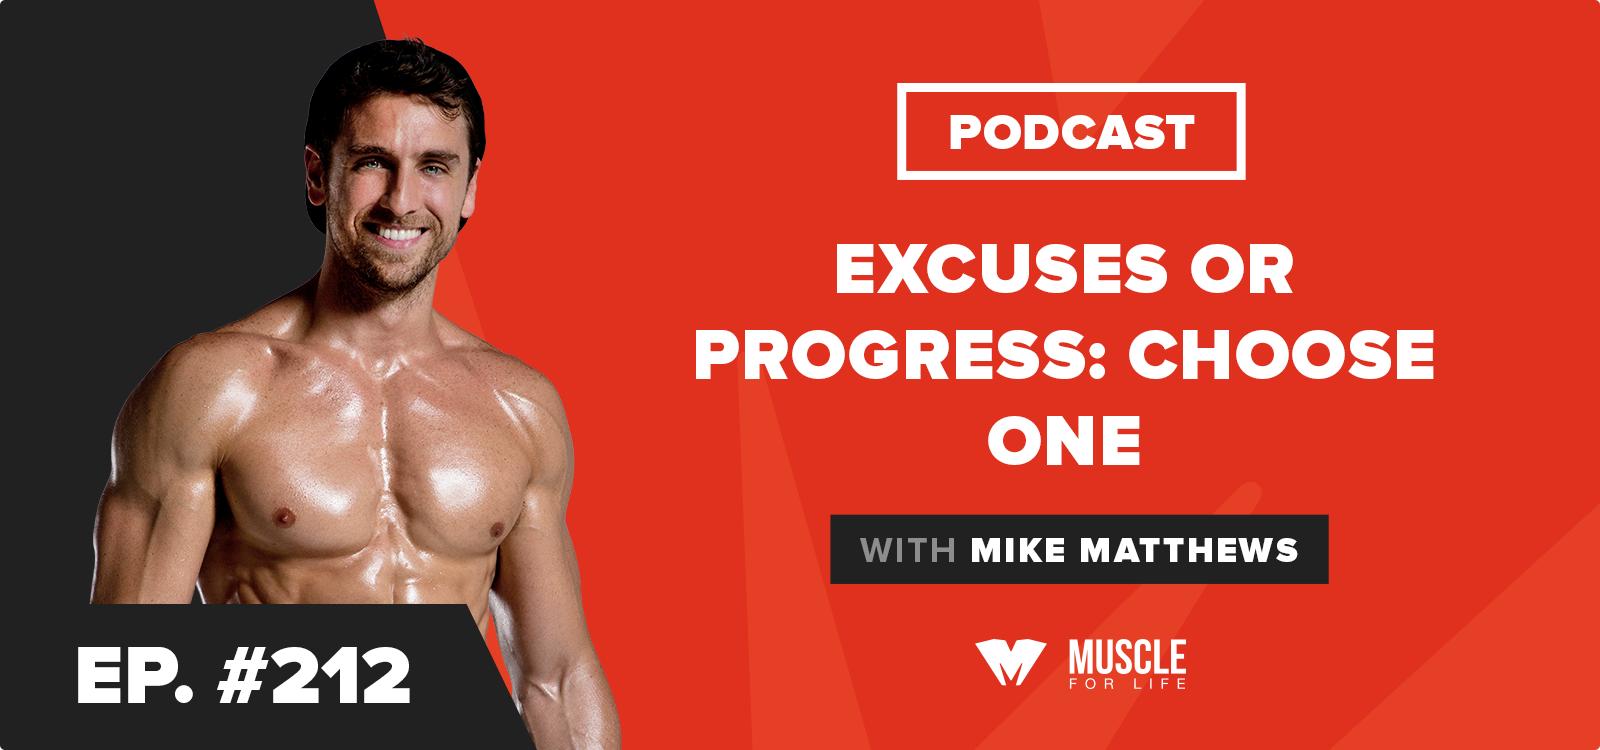 Motivation Monday: Excuses or Progress: Choose One